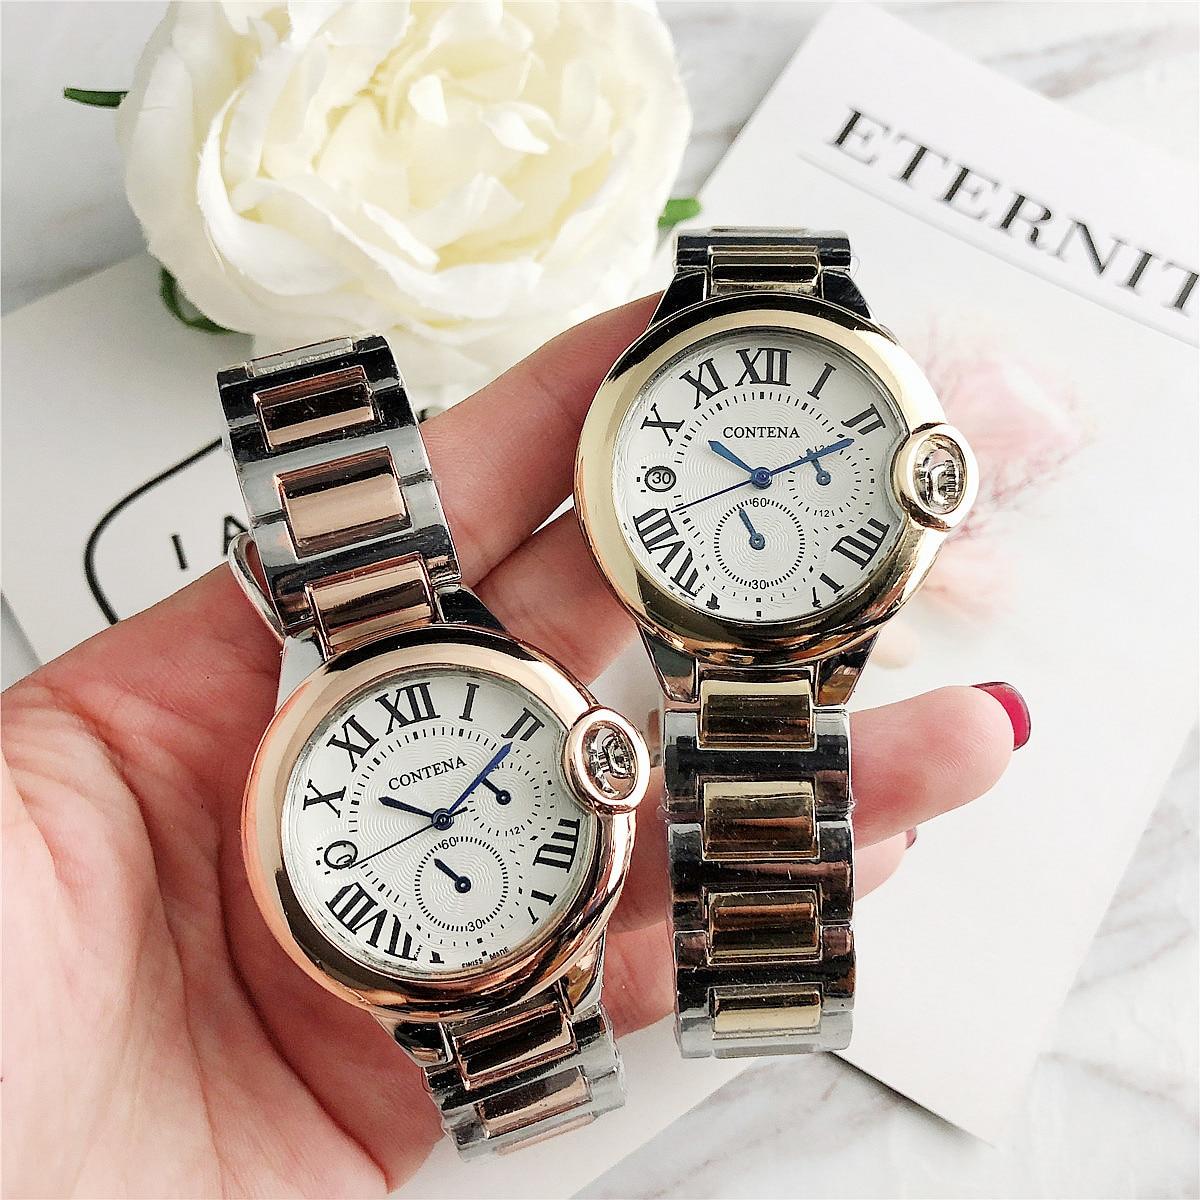 CONTENA Female Women's Wristwatches Quartz Watch  Ladies  Fashion Watch Clock Relogio Feminino Reloj Mujer